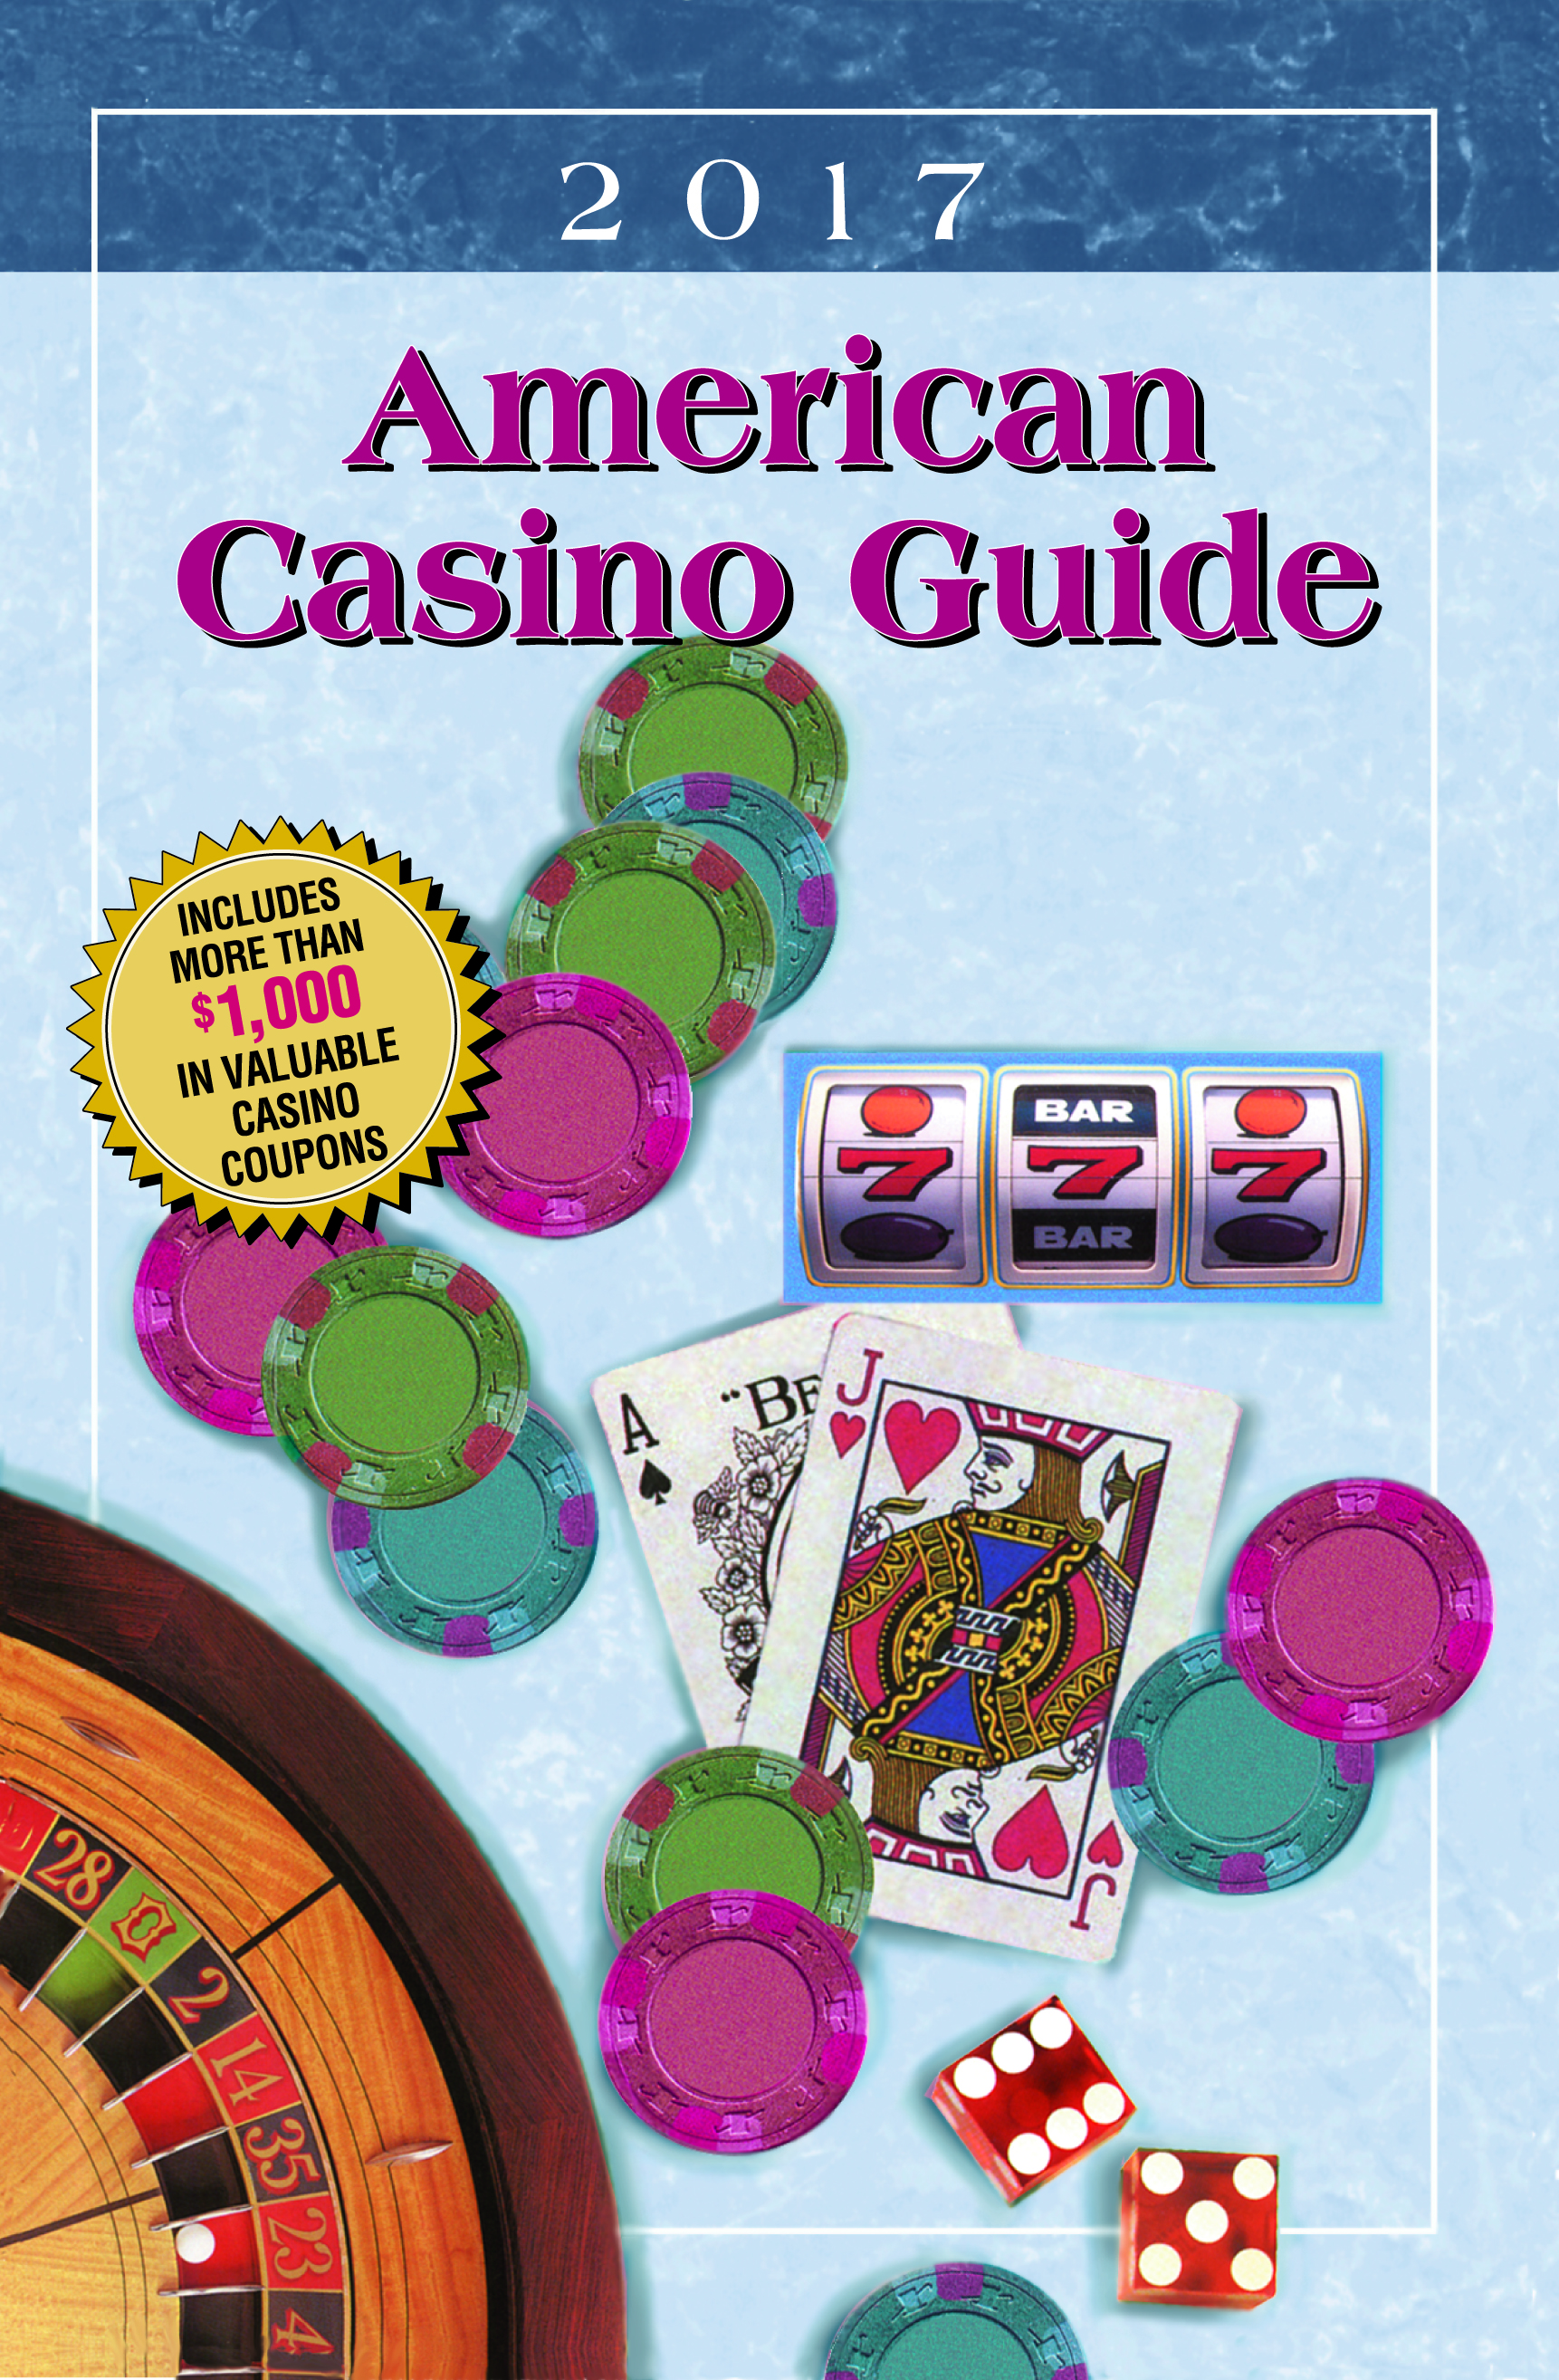 American Casino Guide Show #2 for November 2016: Sharknado Slot Machine from Aristocrat Technologies